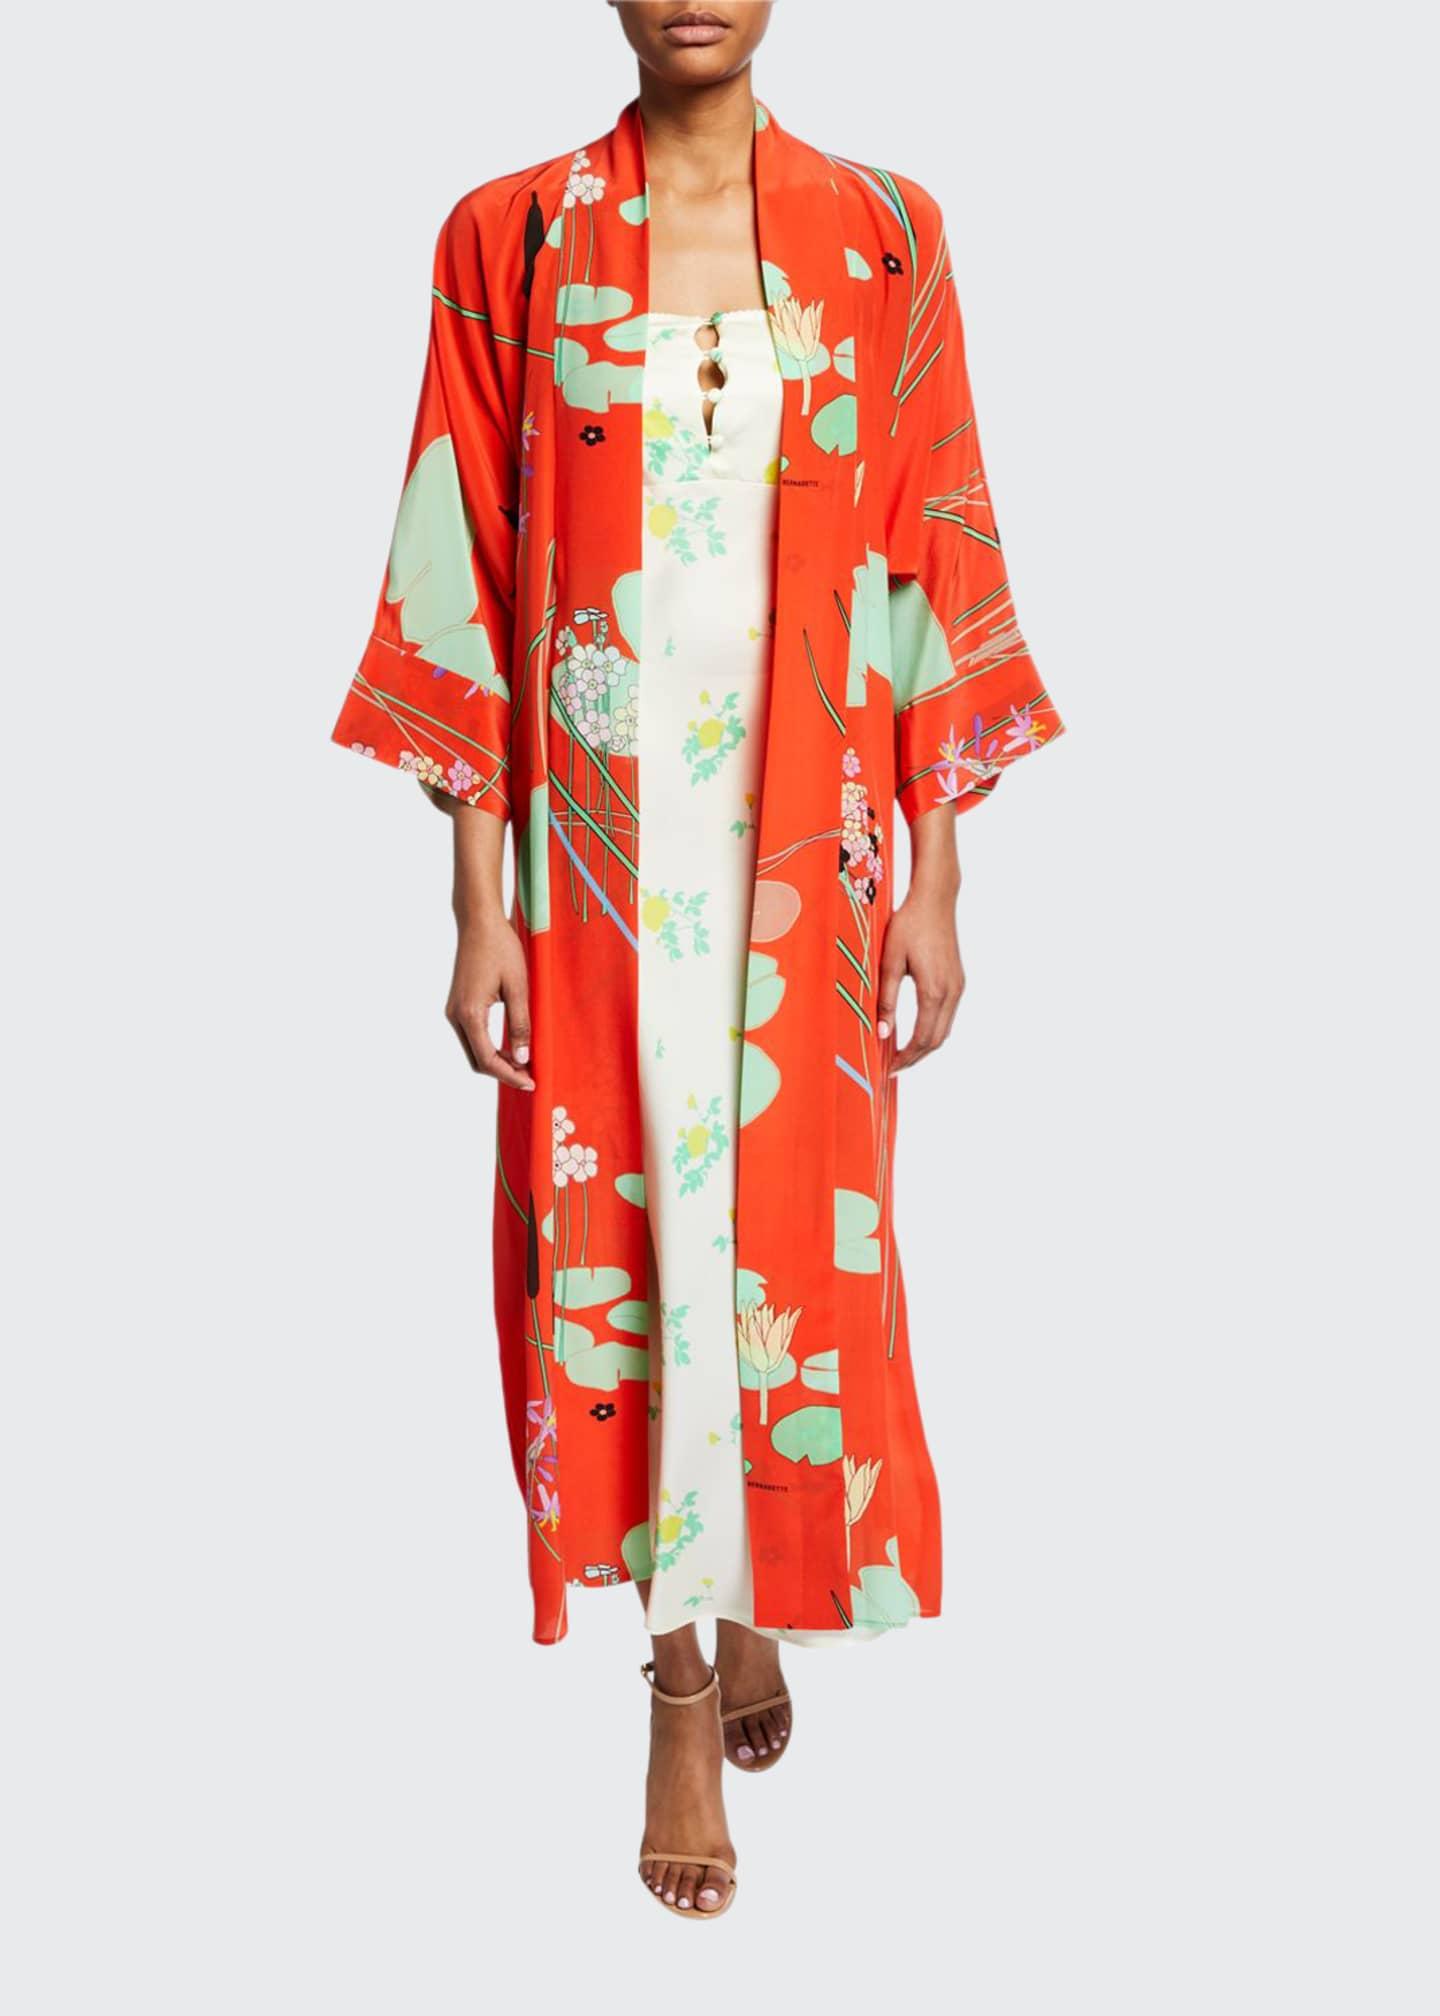 BERNADETTE Floral Print Silk Crepe de Chine Robe,